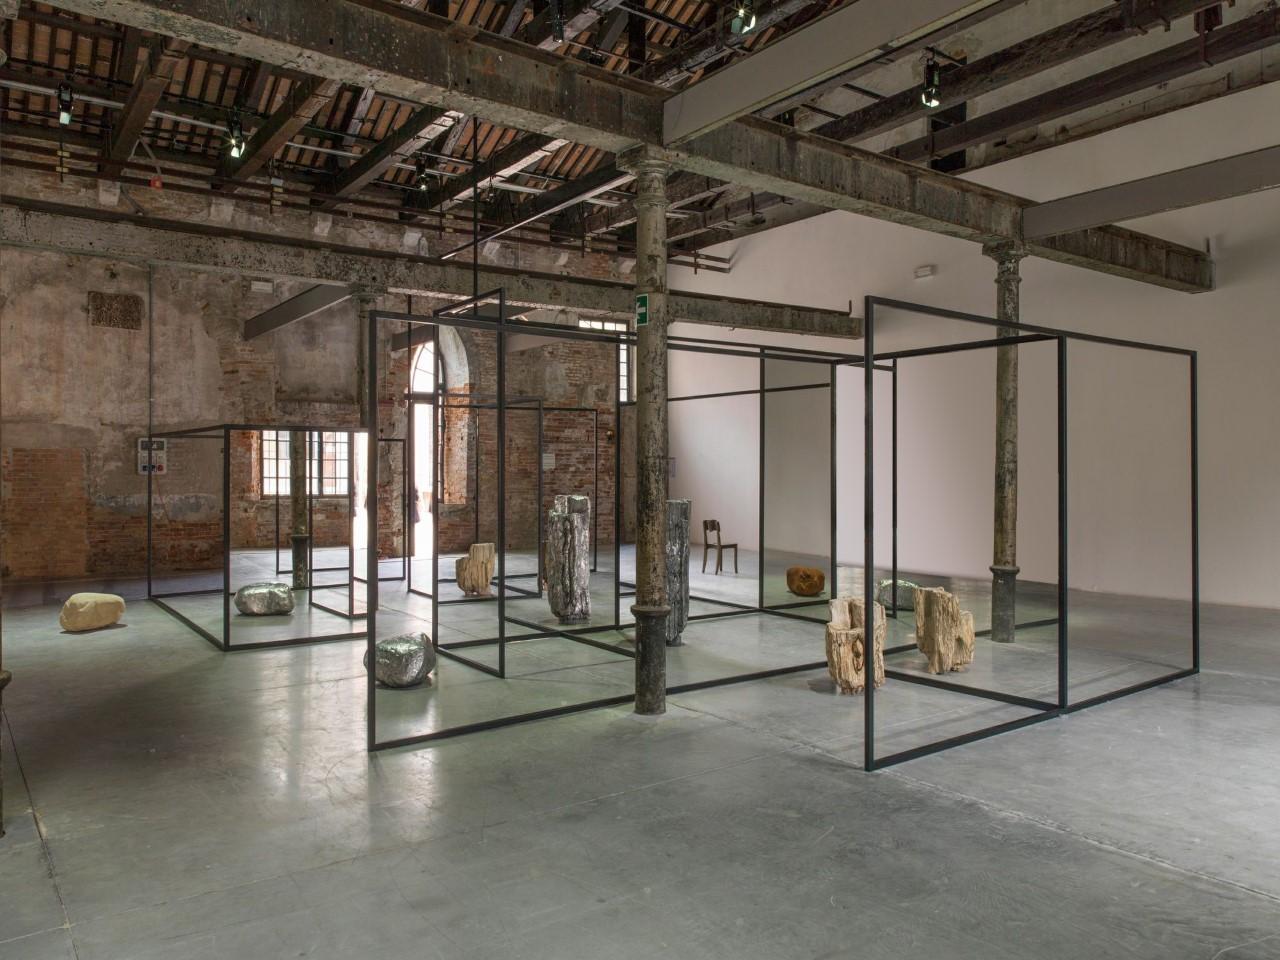 Alicja Kwade Biennale di Venezia, crediti fotografici Alicja Kwade